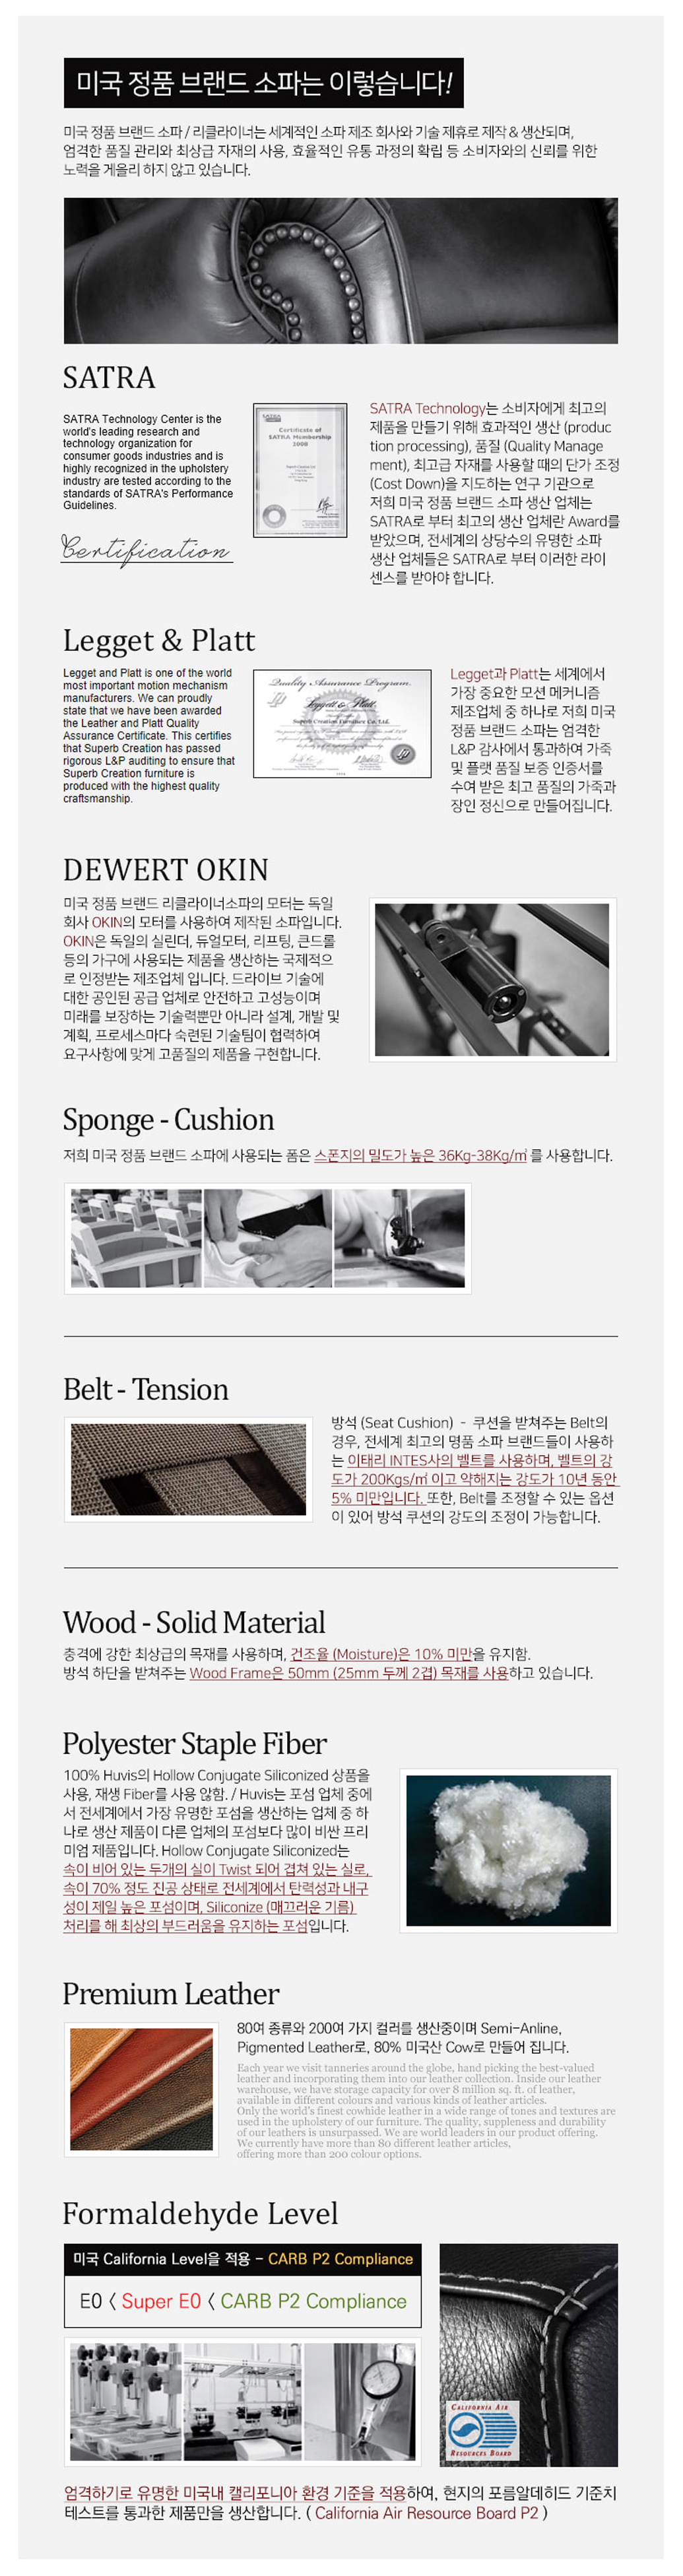 recliner_brand_info.jpg